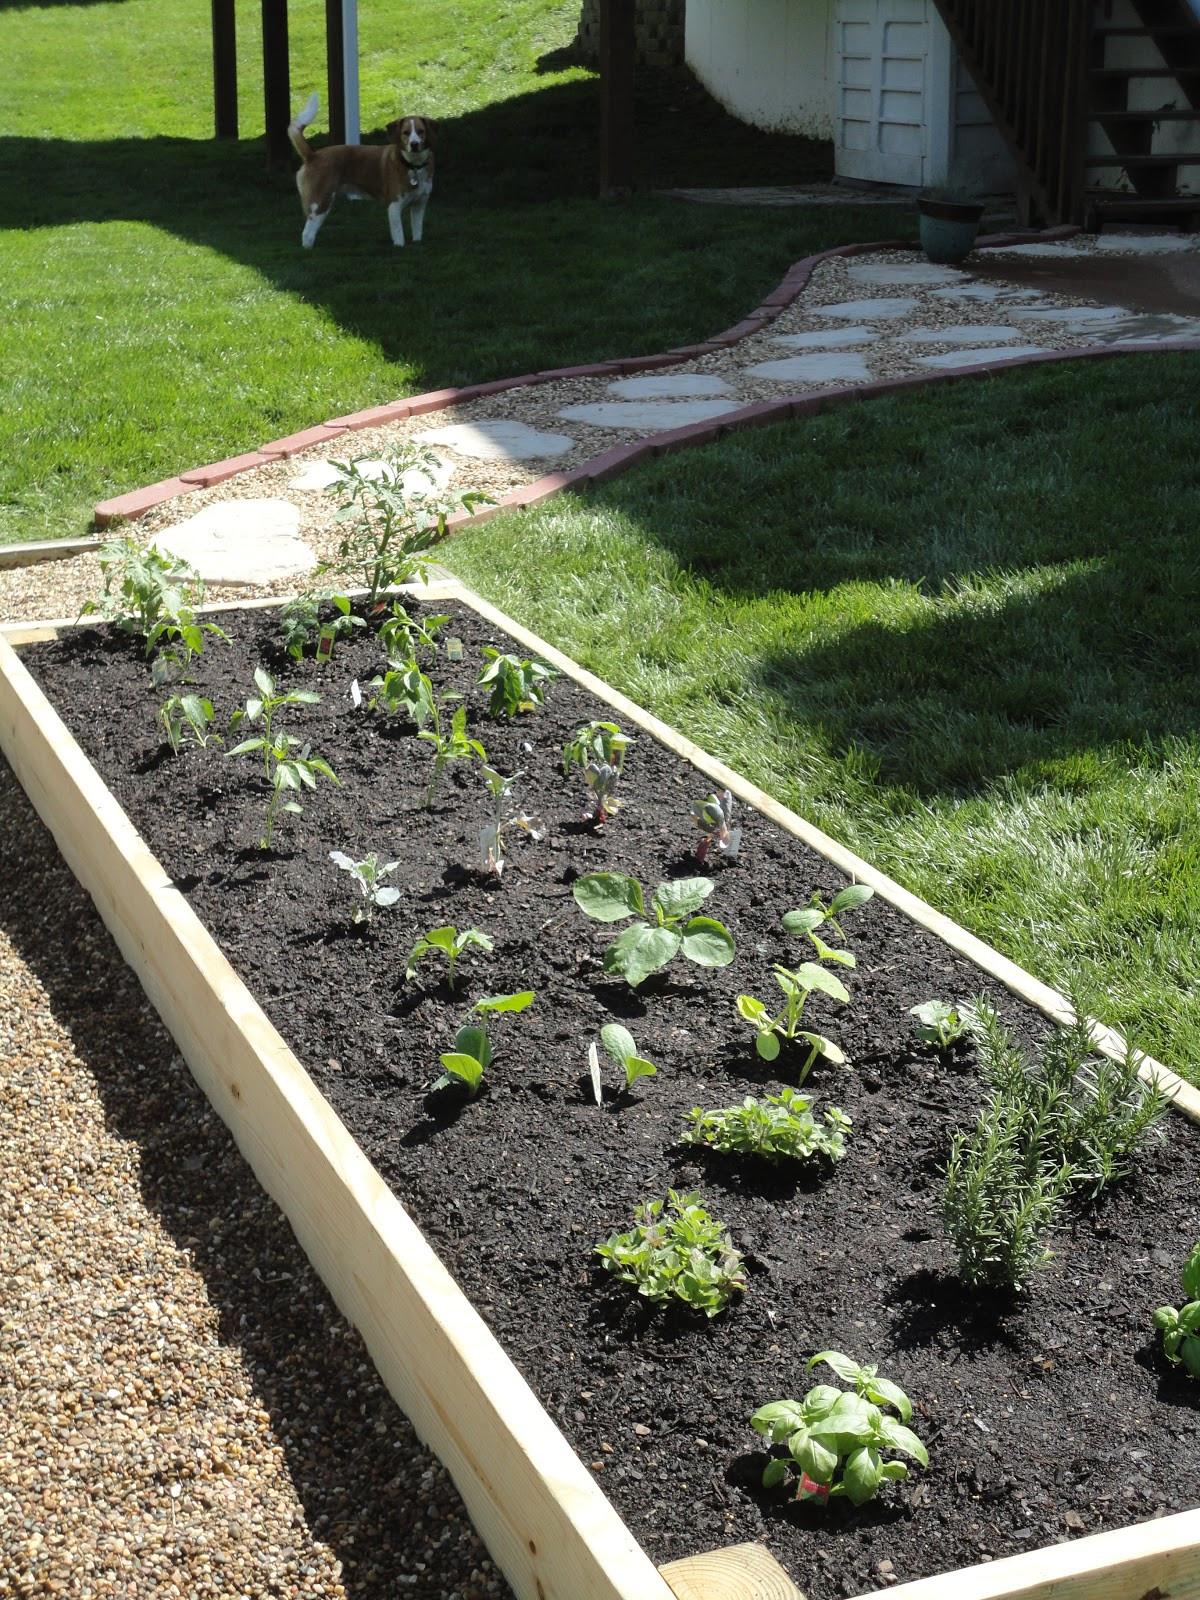 Best ideas about DIY Raised Beds Garden . Save or Pin Vanilla Bean DIY Raised Garden Bed Now.